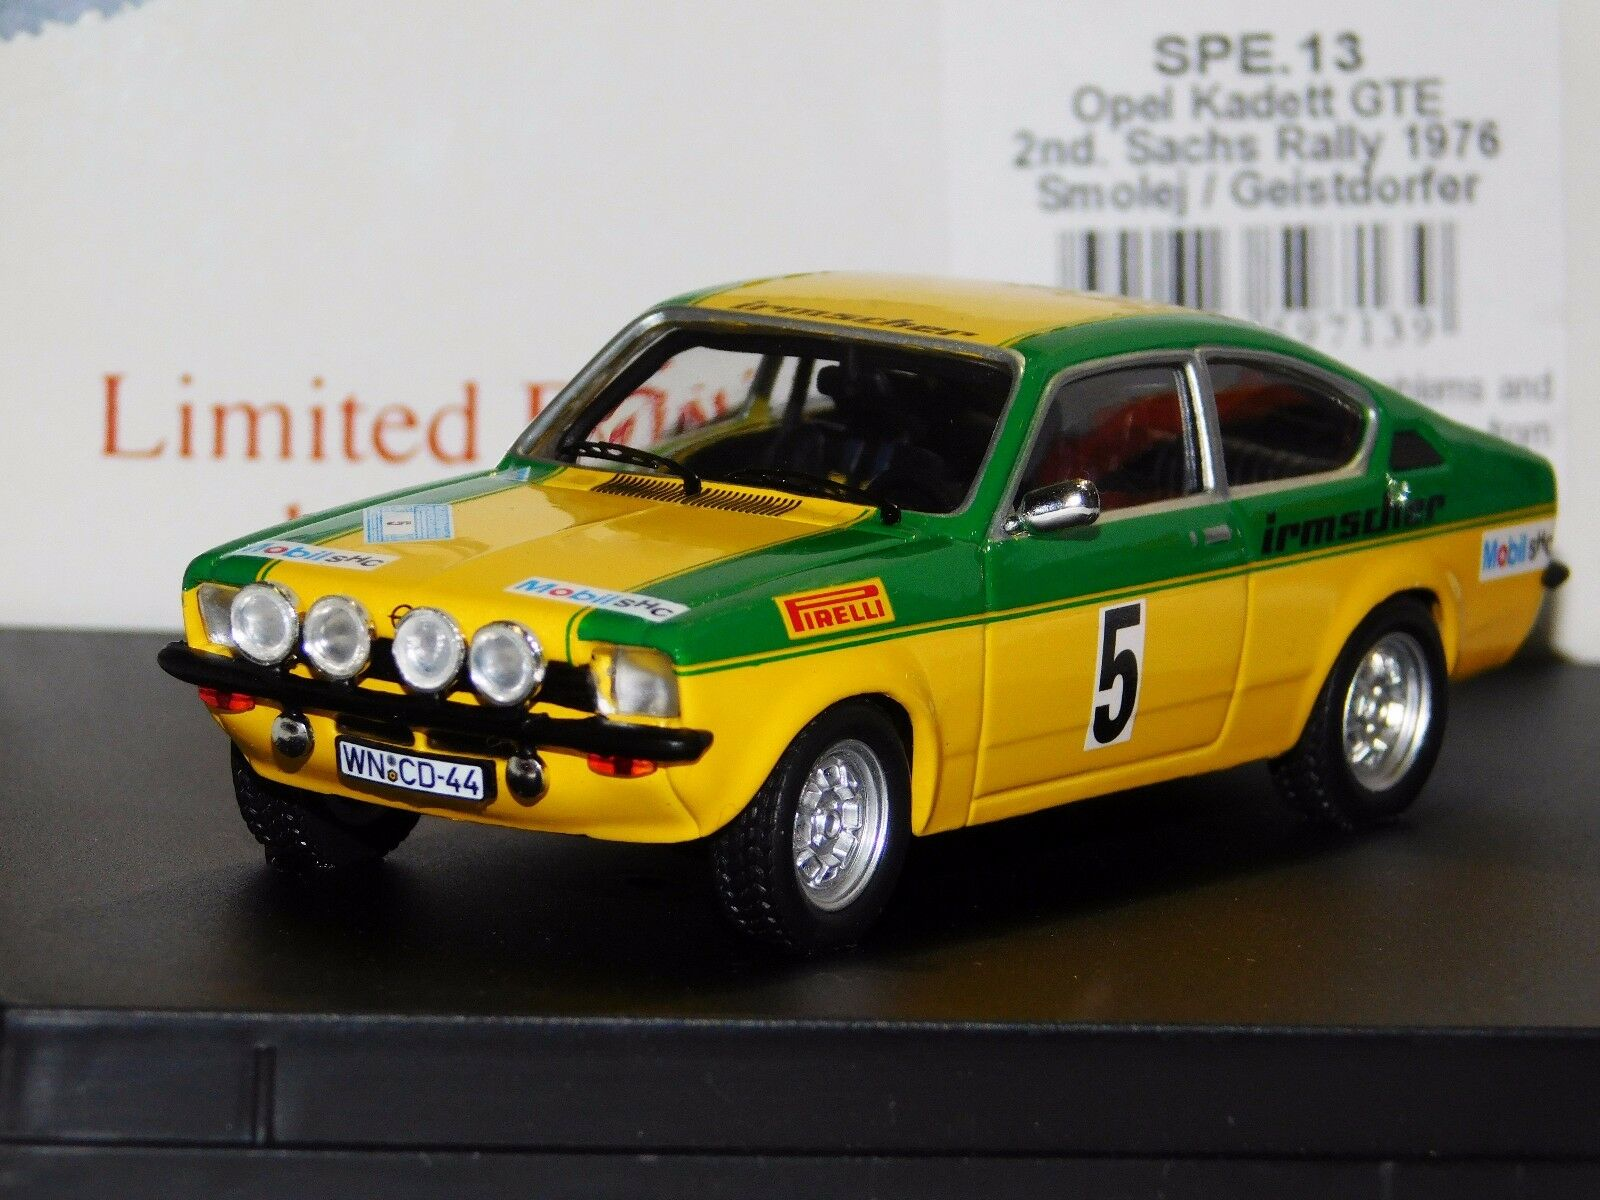 OPEL KADETT GTE  SMOLEJ 2nd WINNER SACHS RALLY 1976 TROFEU SP. ED. SPE13 1 43